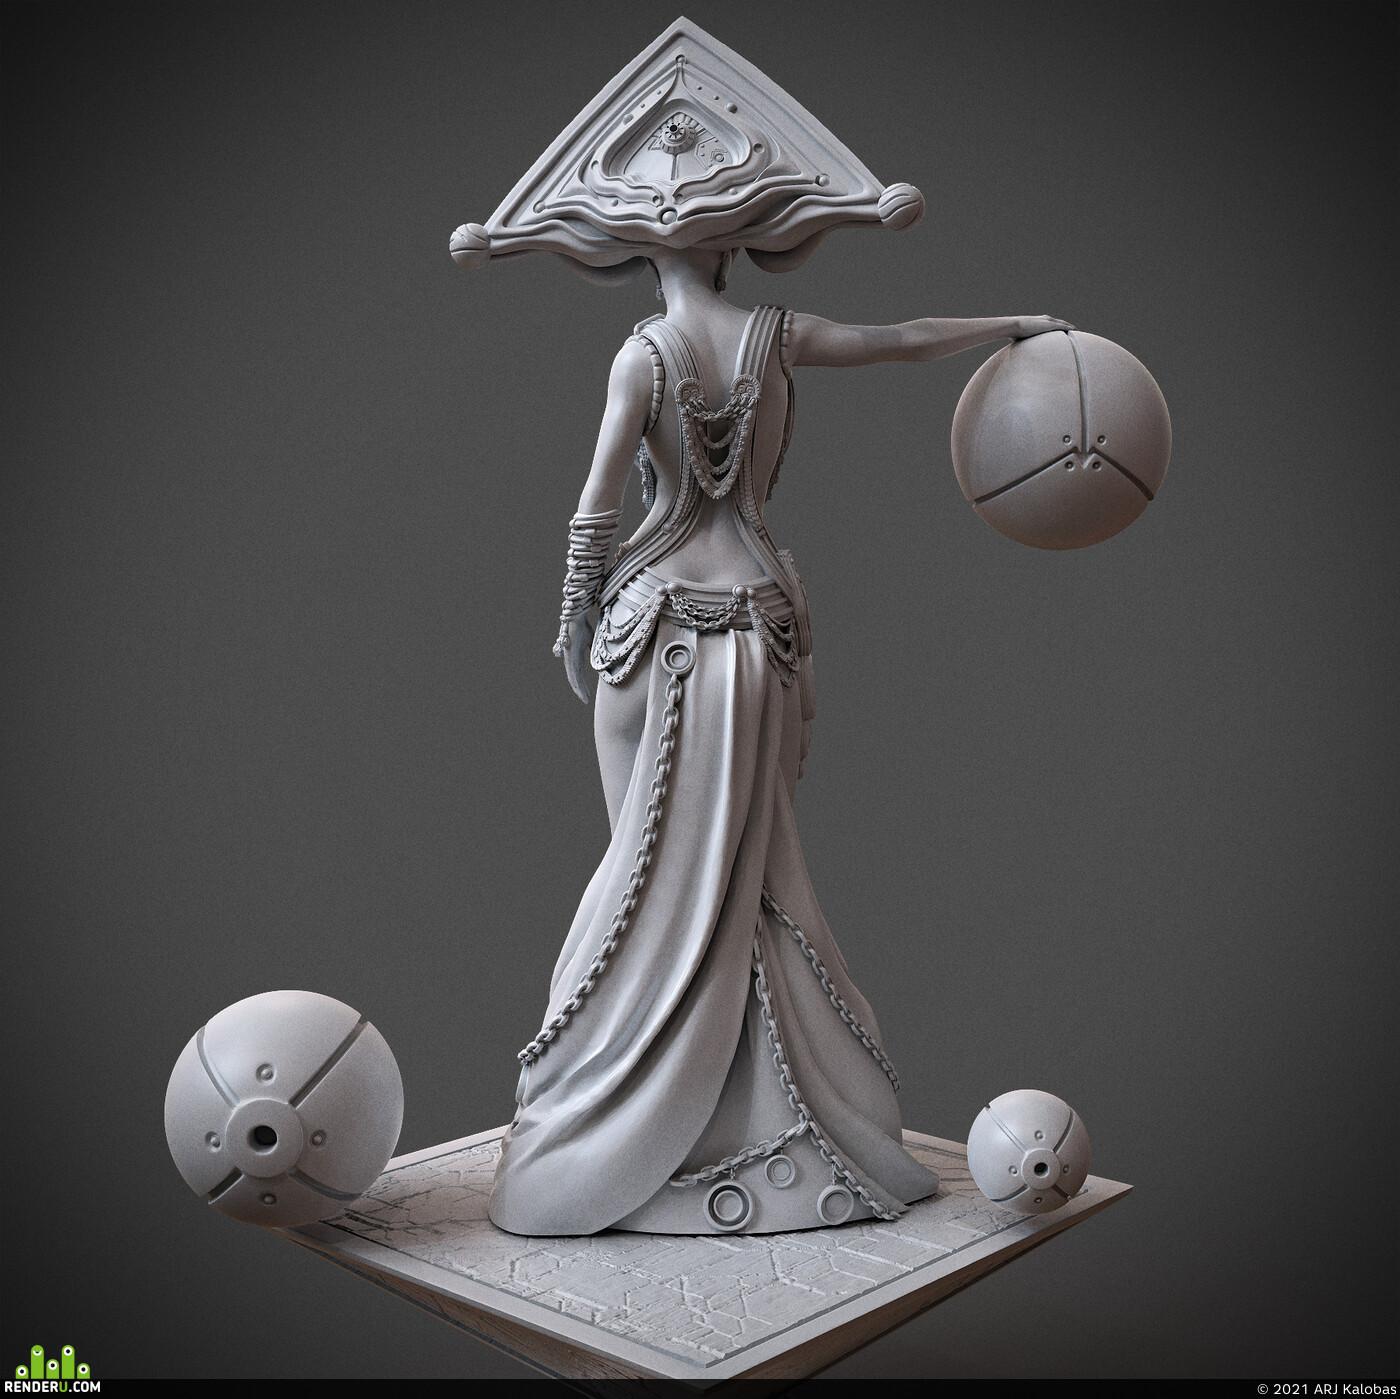 Digital 3D, 3D Printing, Fantasy, Science Fiction, Character Modeling, miniature, arjkalobas, sculpt, 3dprint